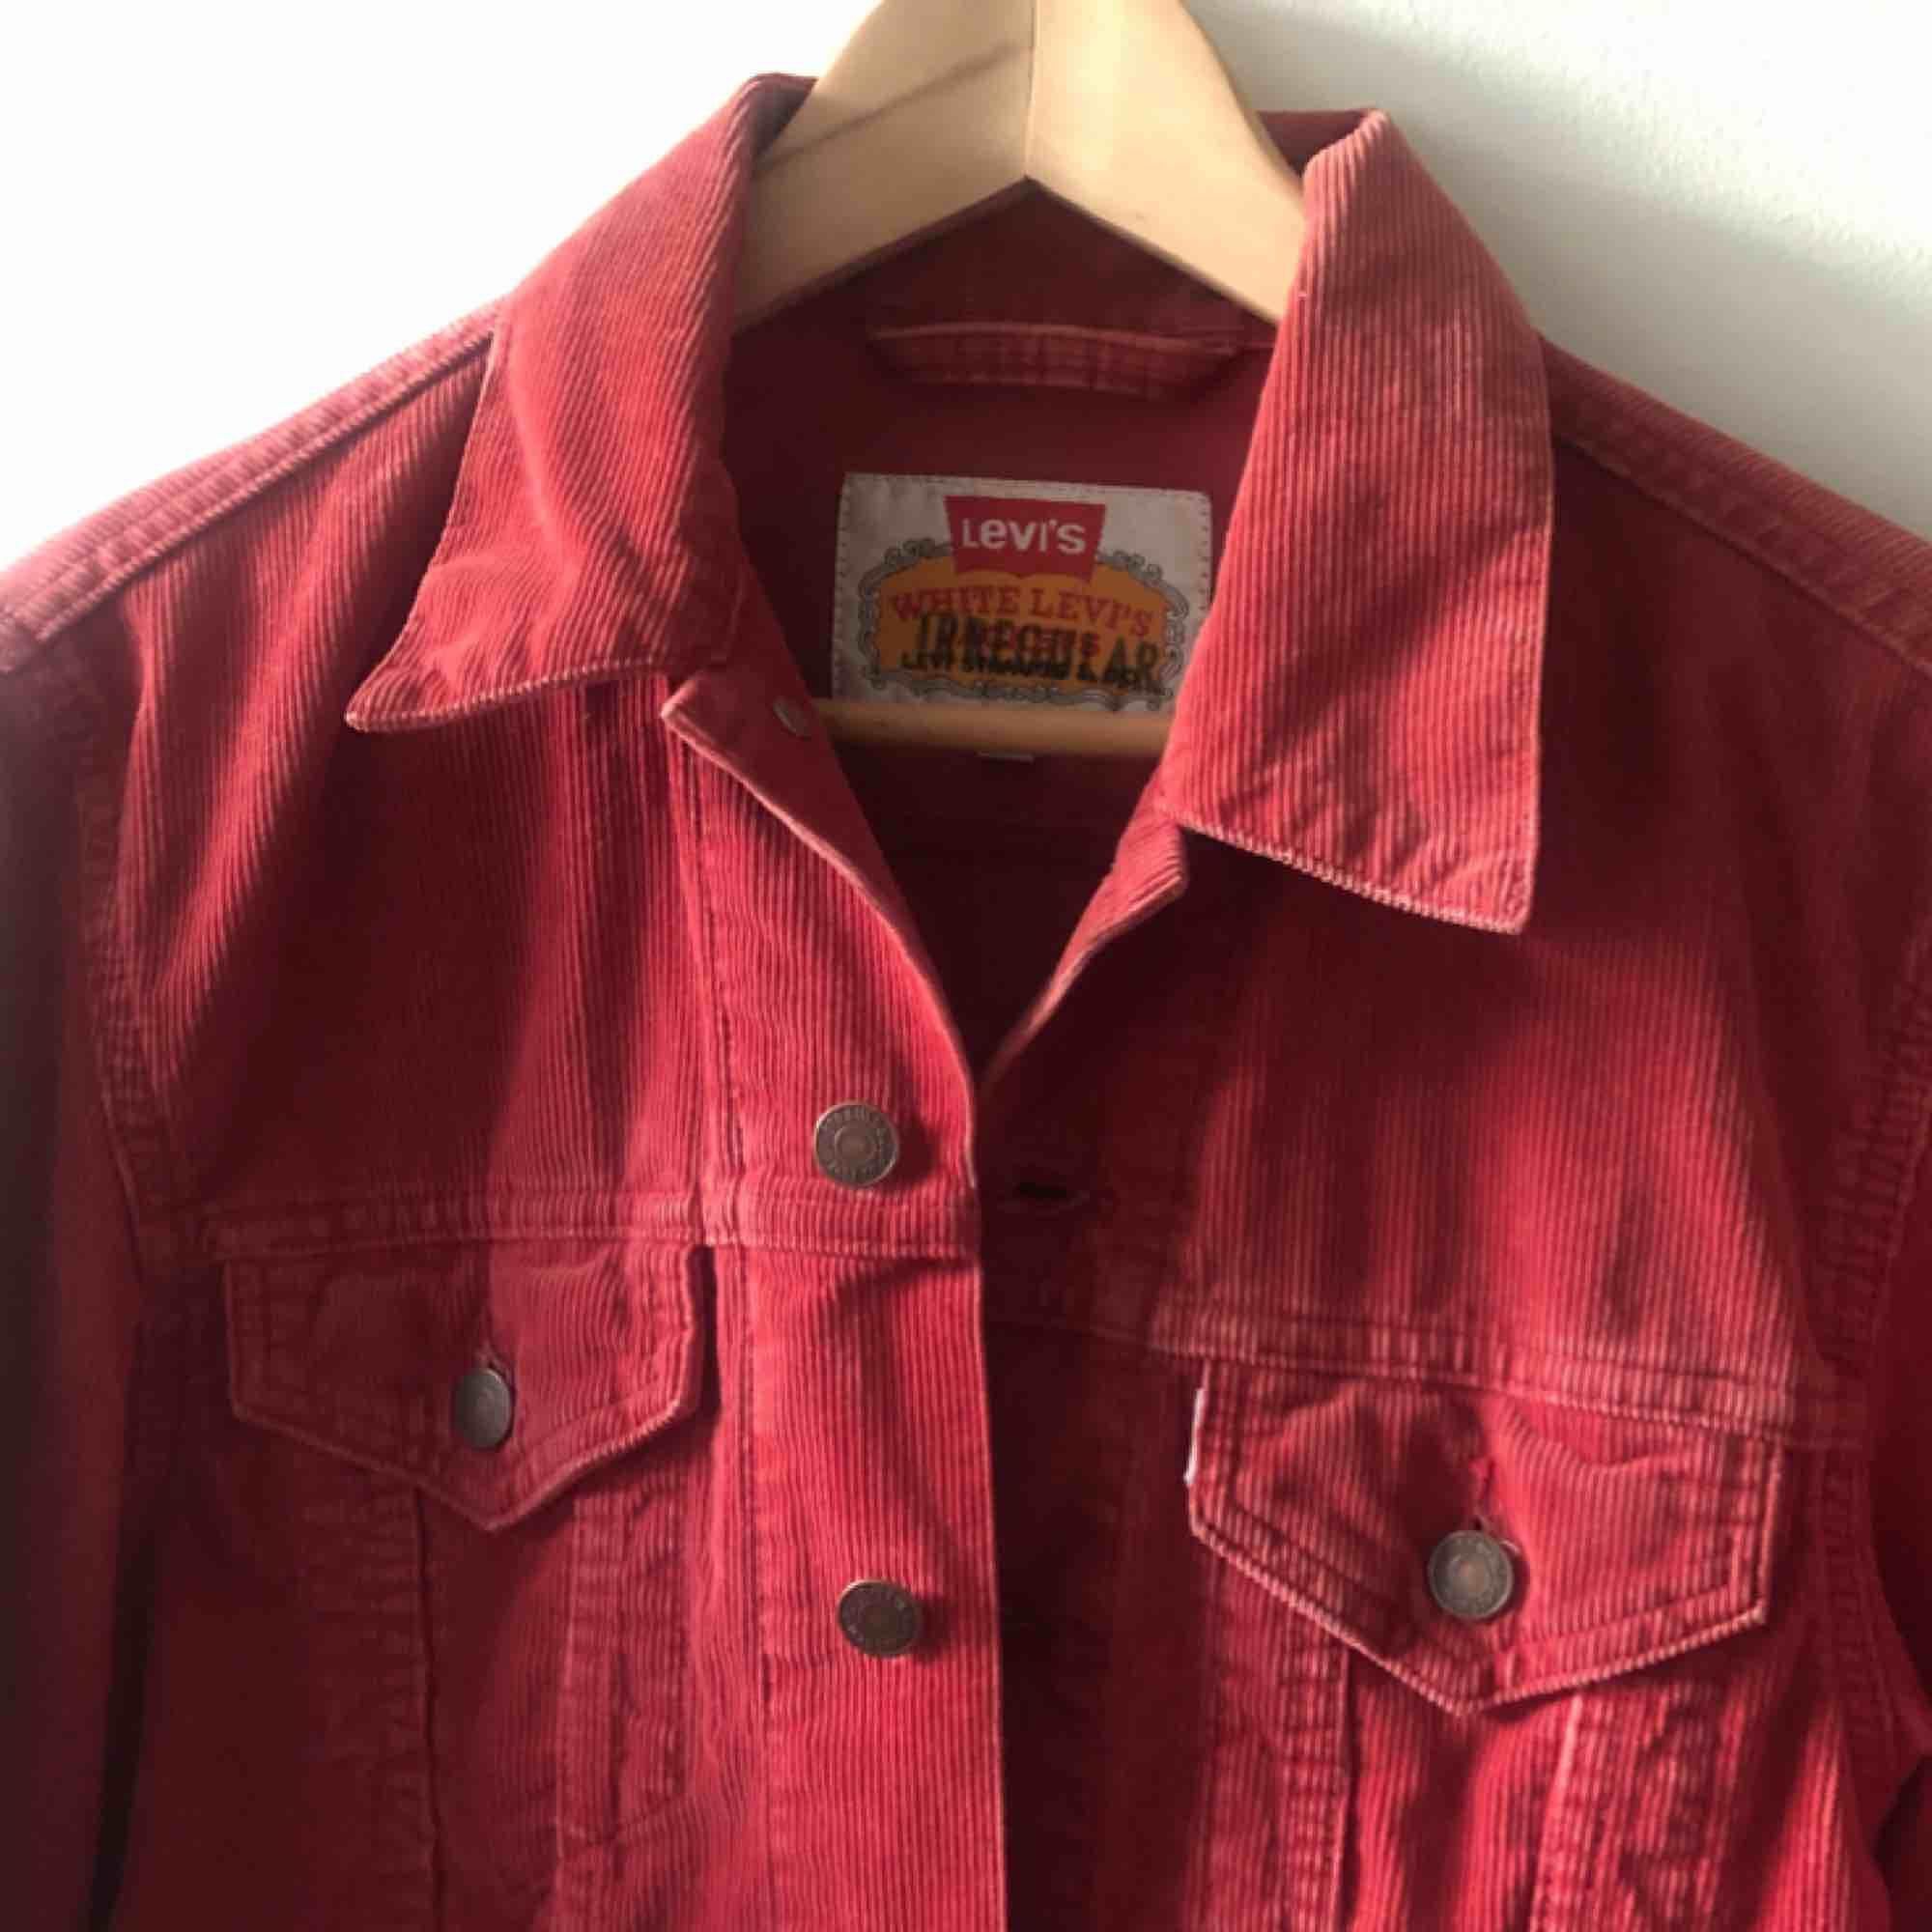 51053c9a3653 Vintage Manchester jeansjacka från Levis. Troligtvis tidigt 80-tal.